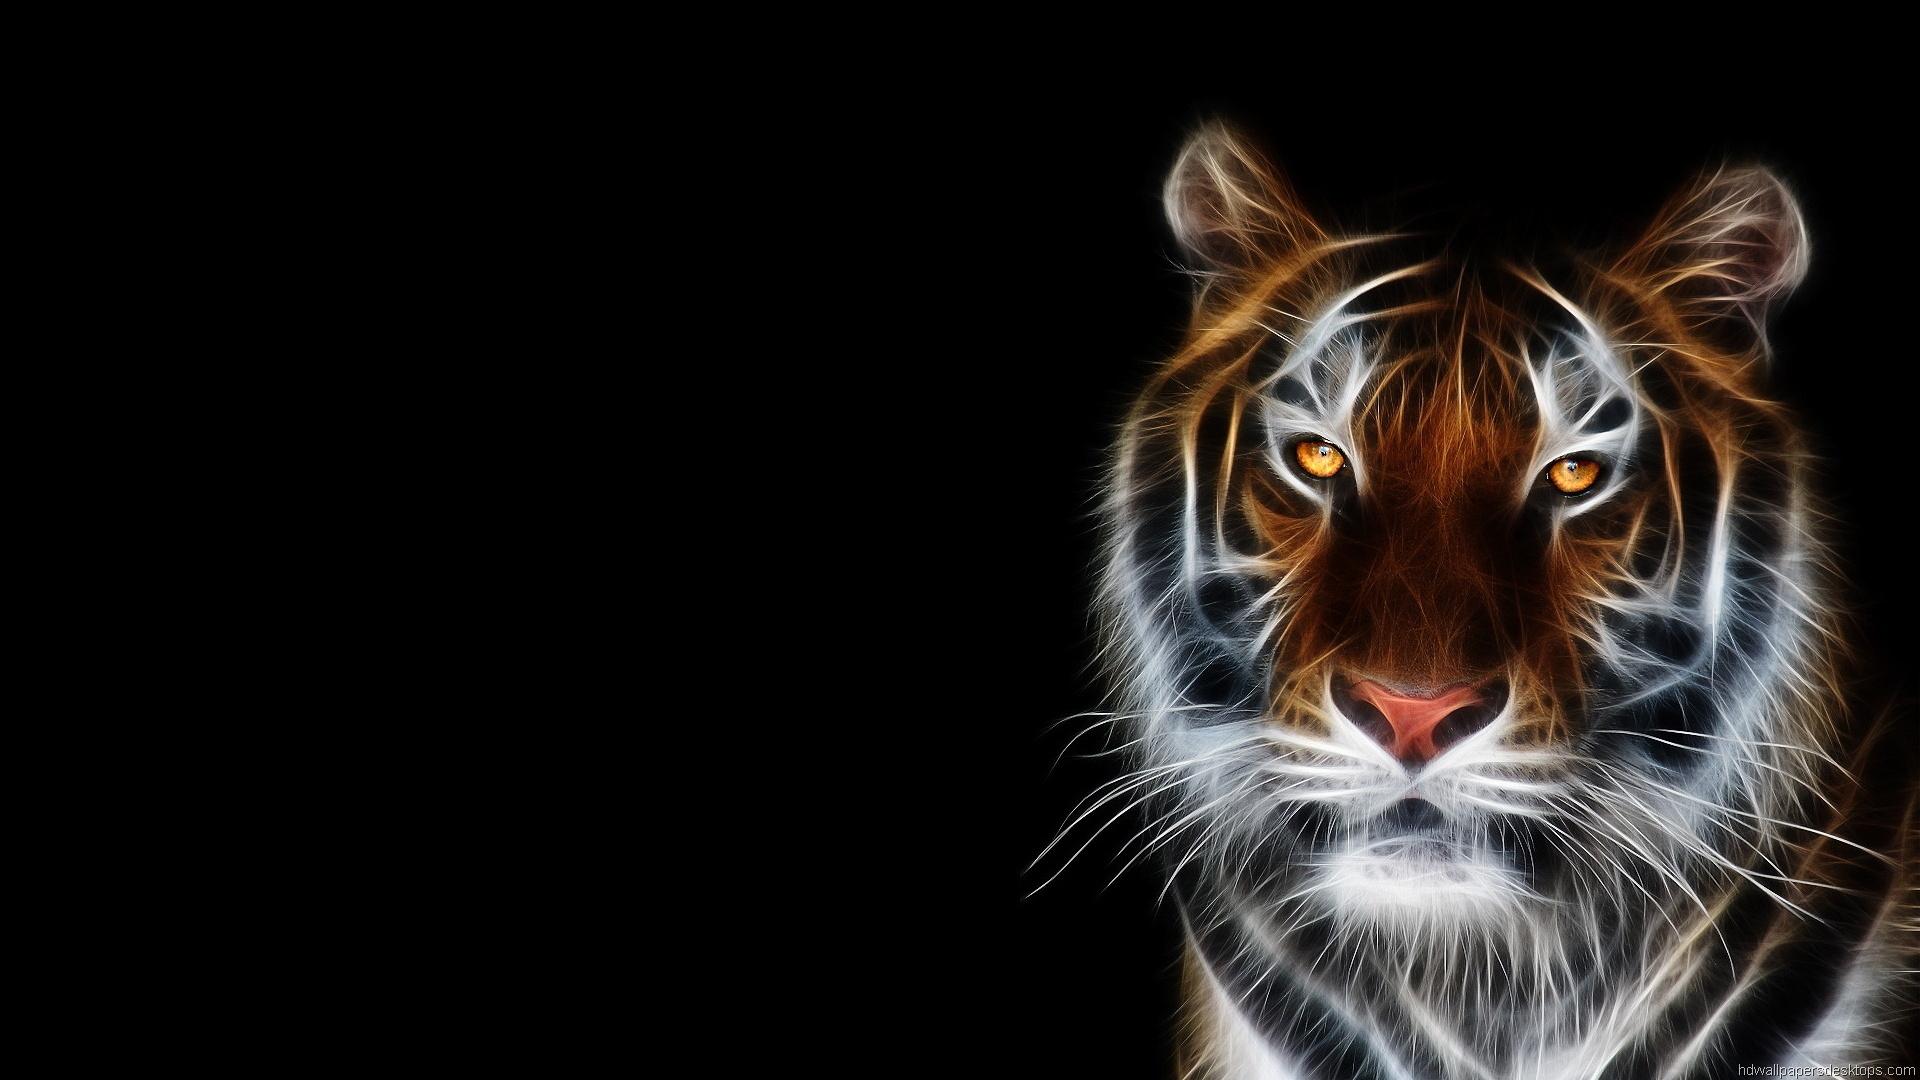 Animals Widescreen Desktop Backgrounds Photos Wallpapers 1920x1080